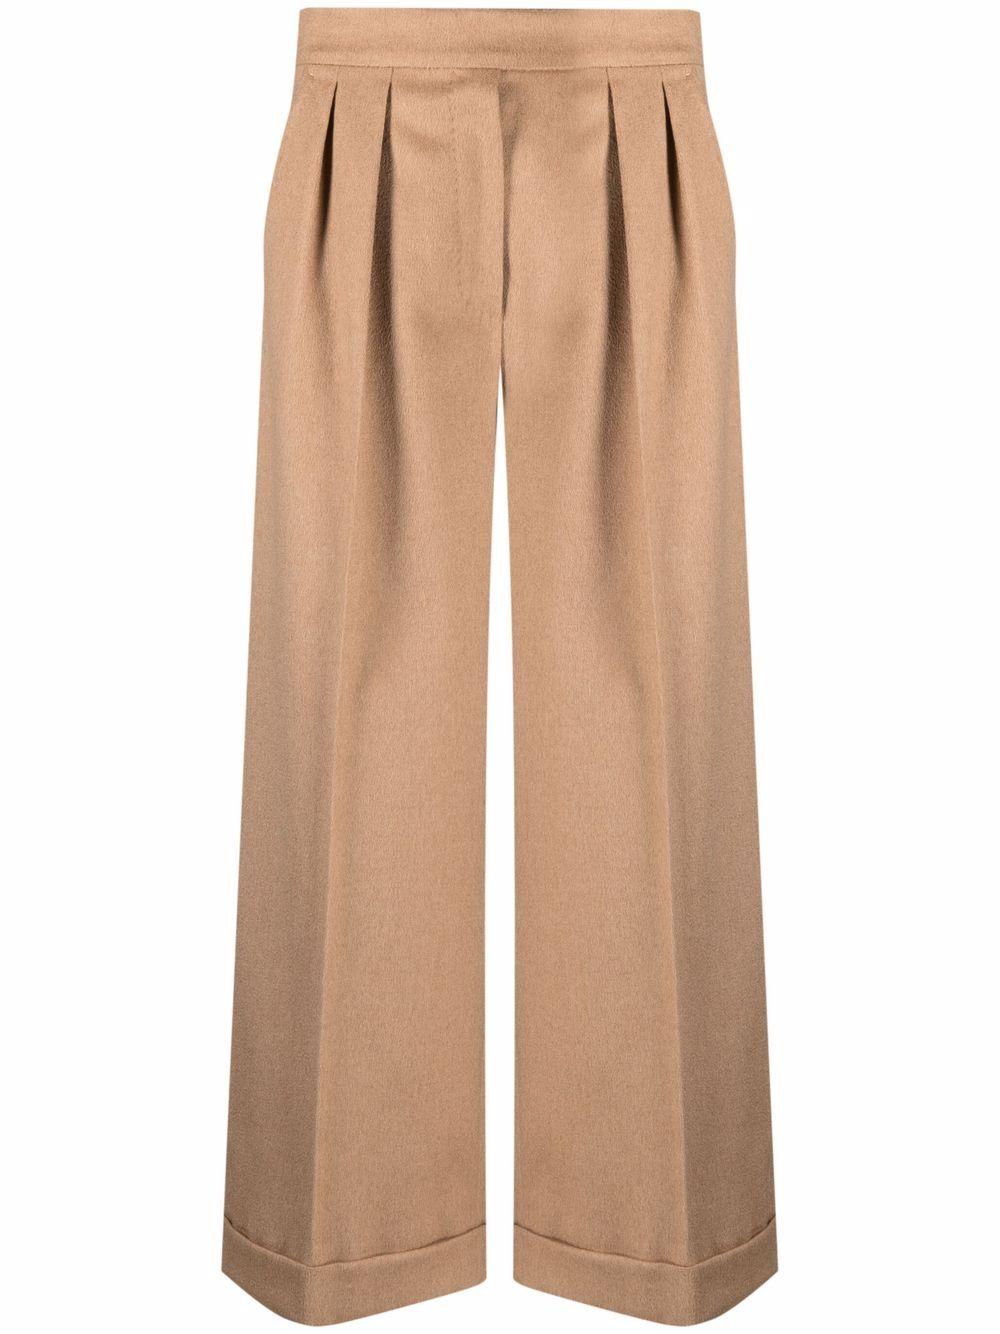 MAX MARA- Micio Trousers- Woman- 40 - Brown